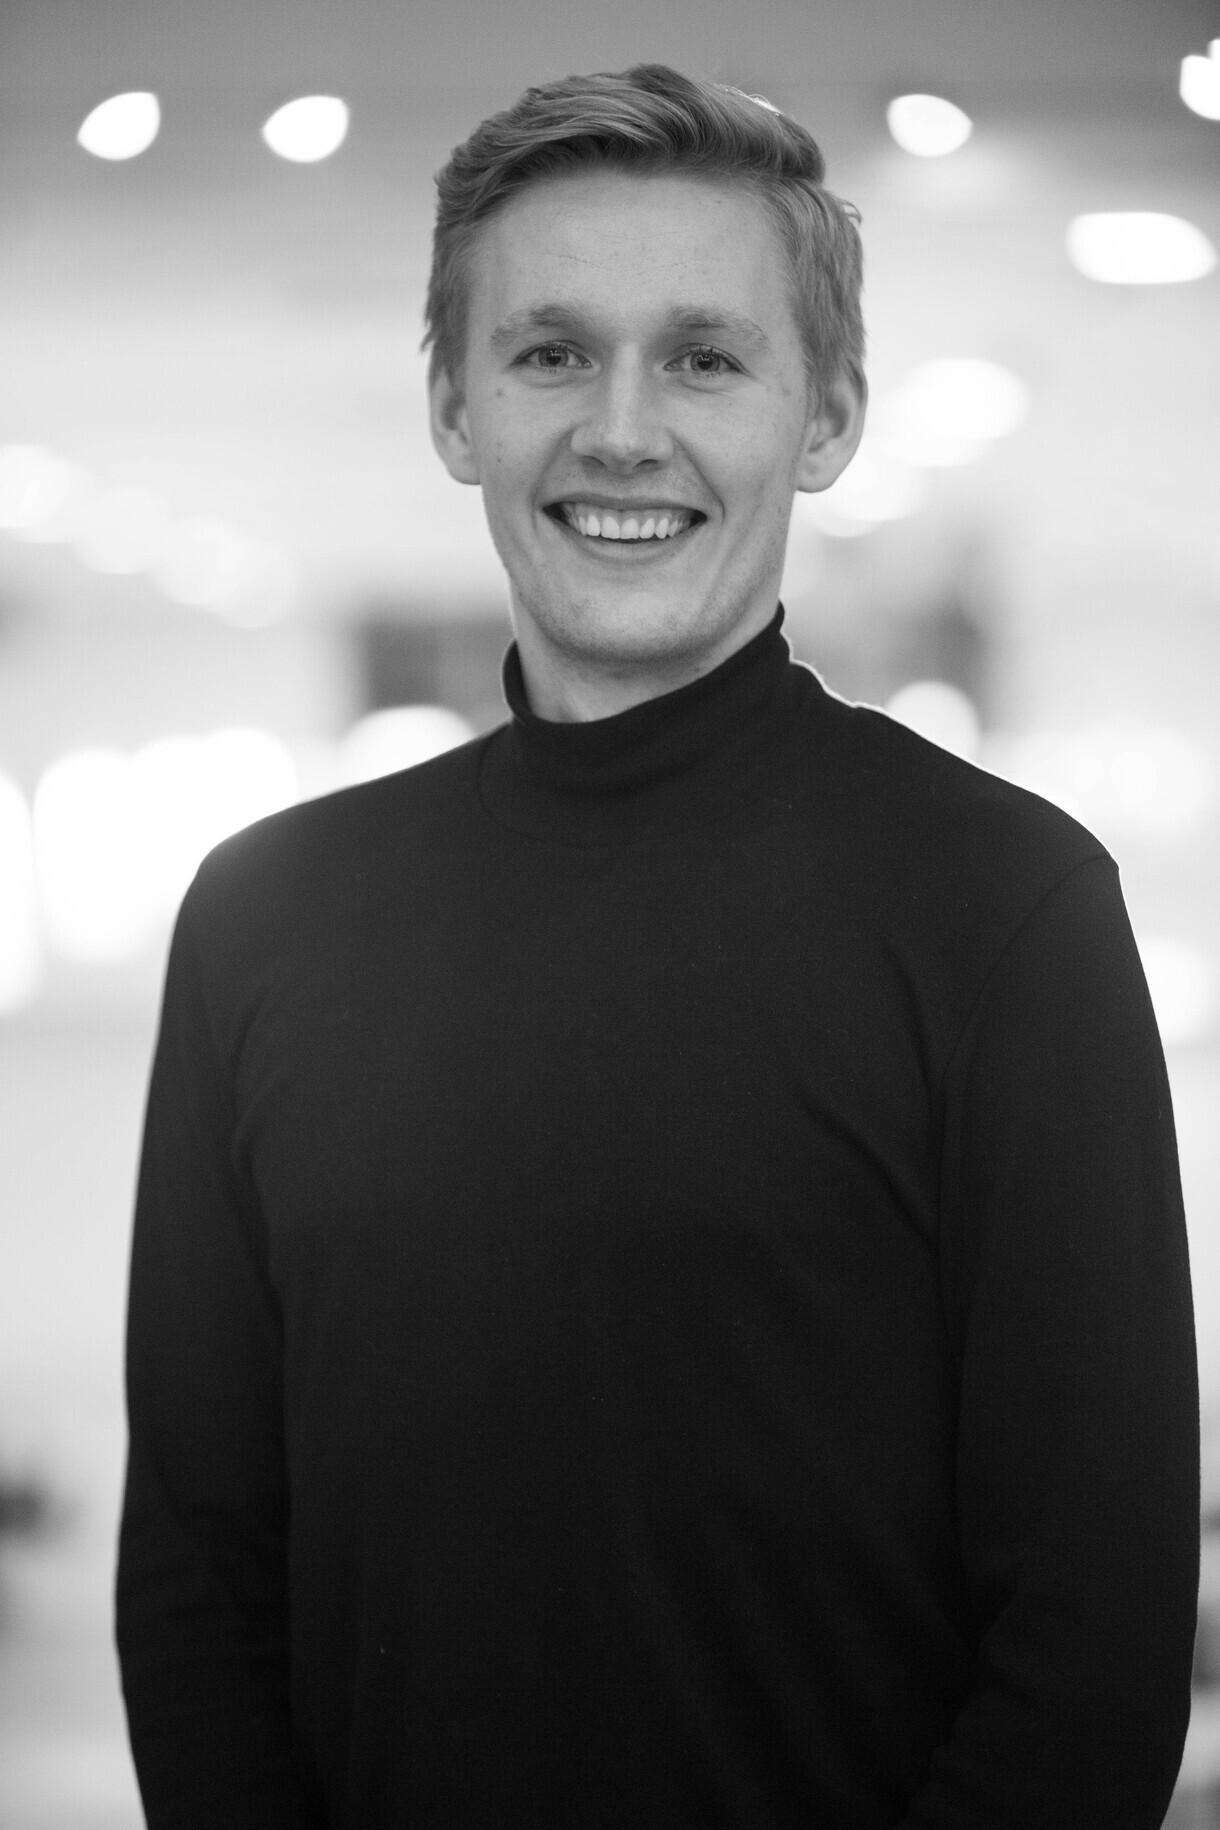 Christoffer Hingelberg